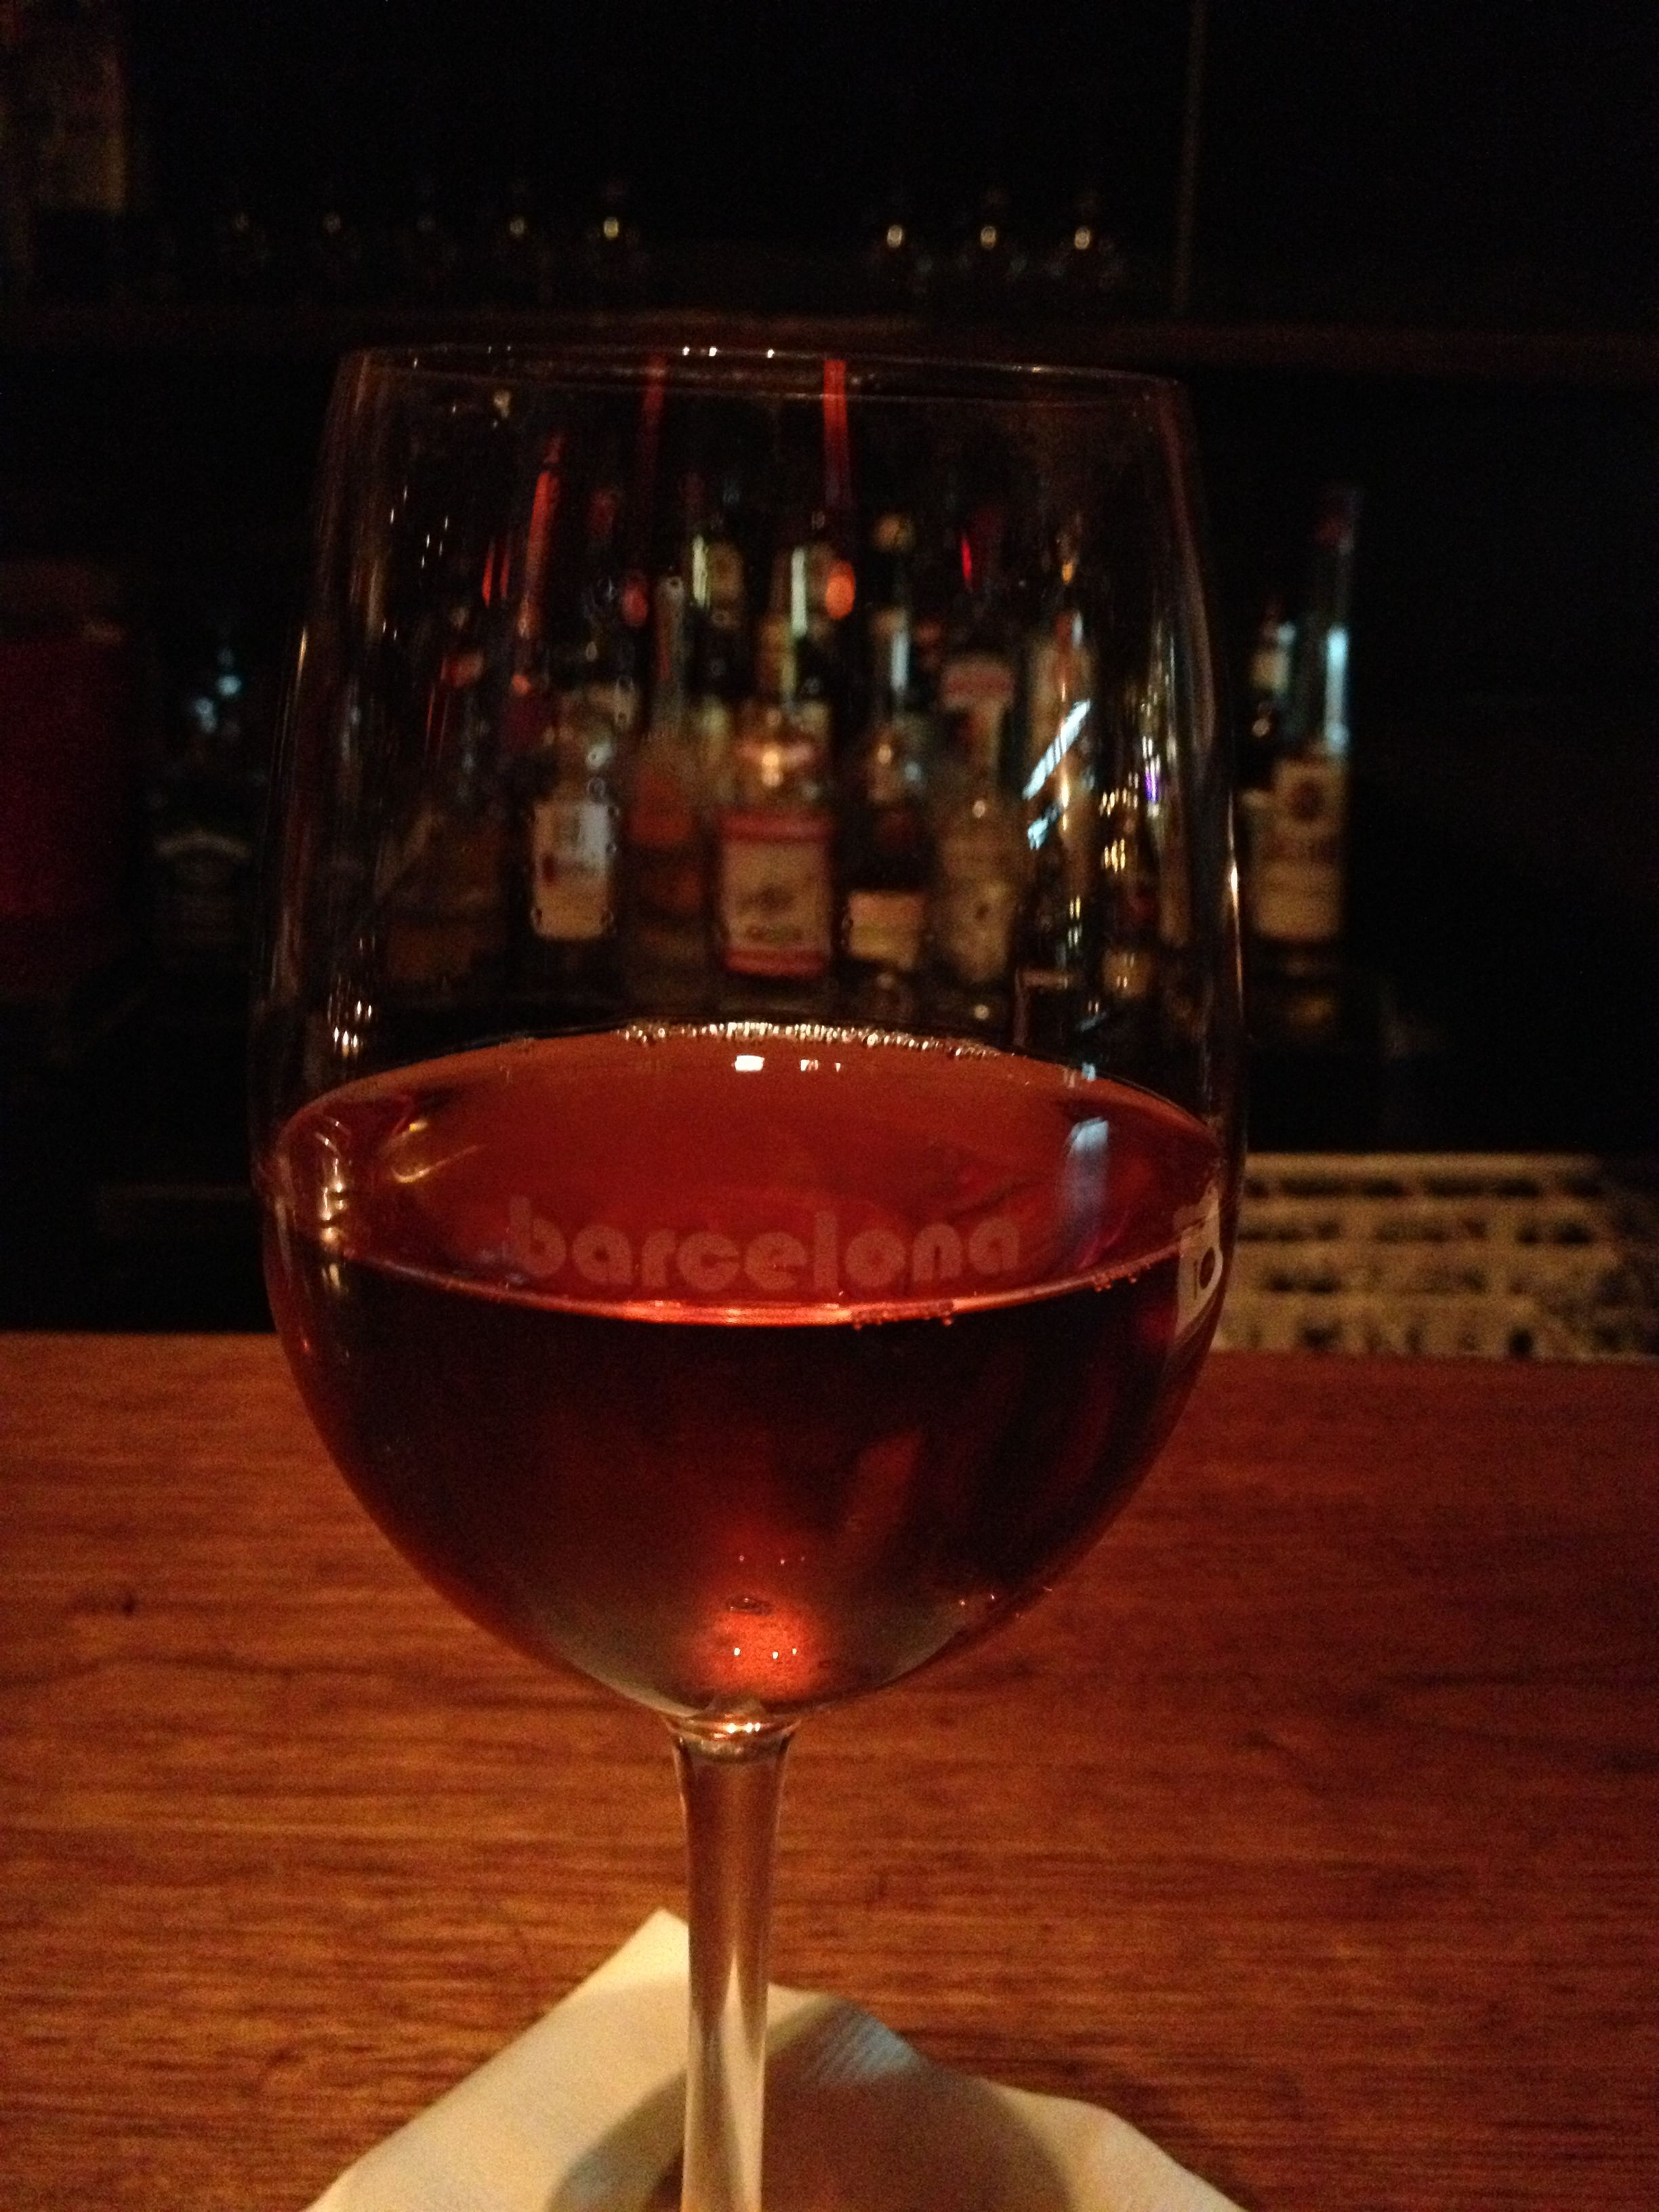 Sauska Villanyi Rose Fresh And Lush Fruit Flavors Of Sweet Strawberry Pic Taken At Barcelona Sono Norwalk Ct Wines Red Wine White Wine